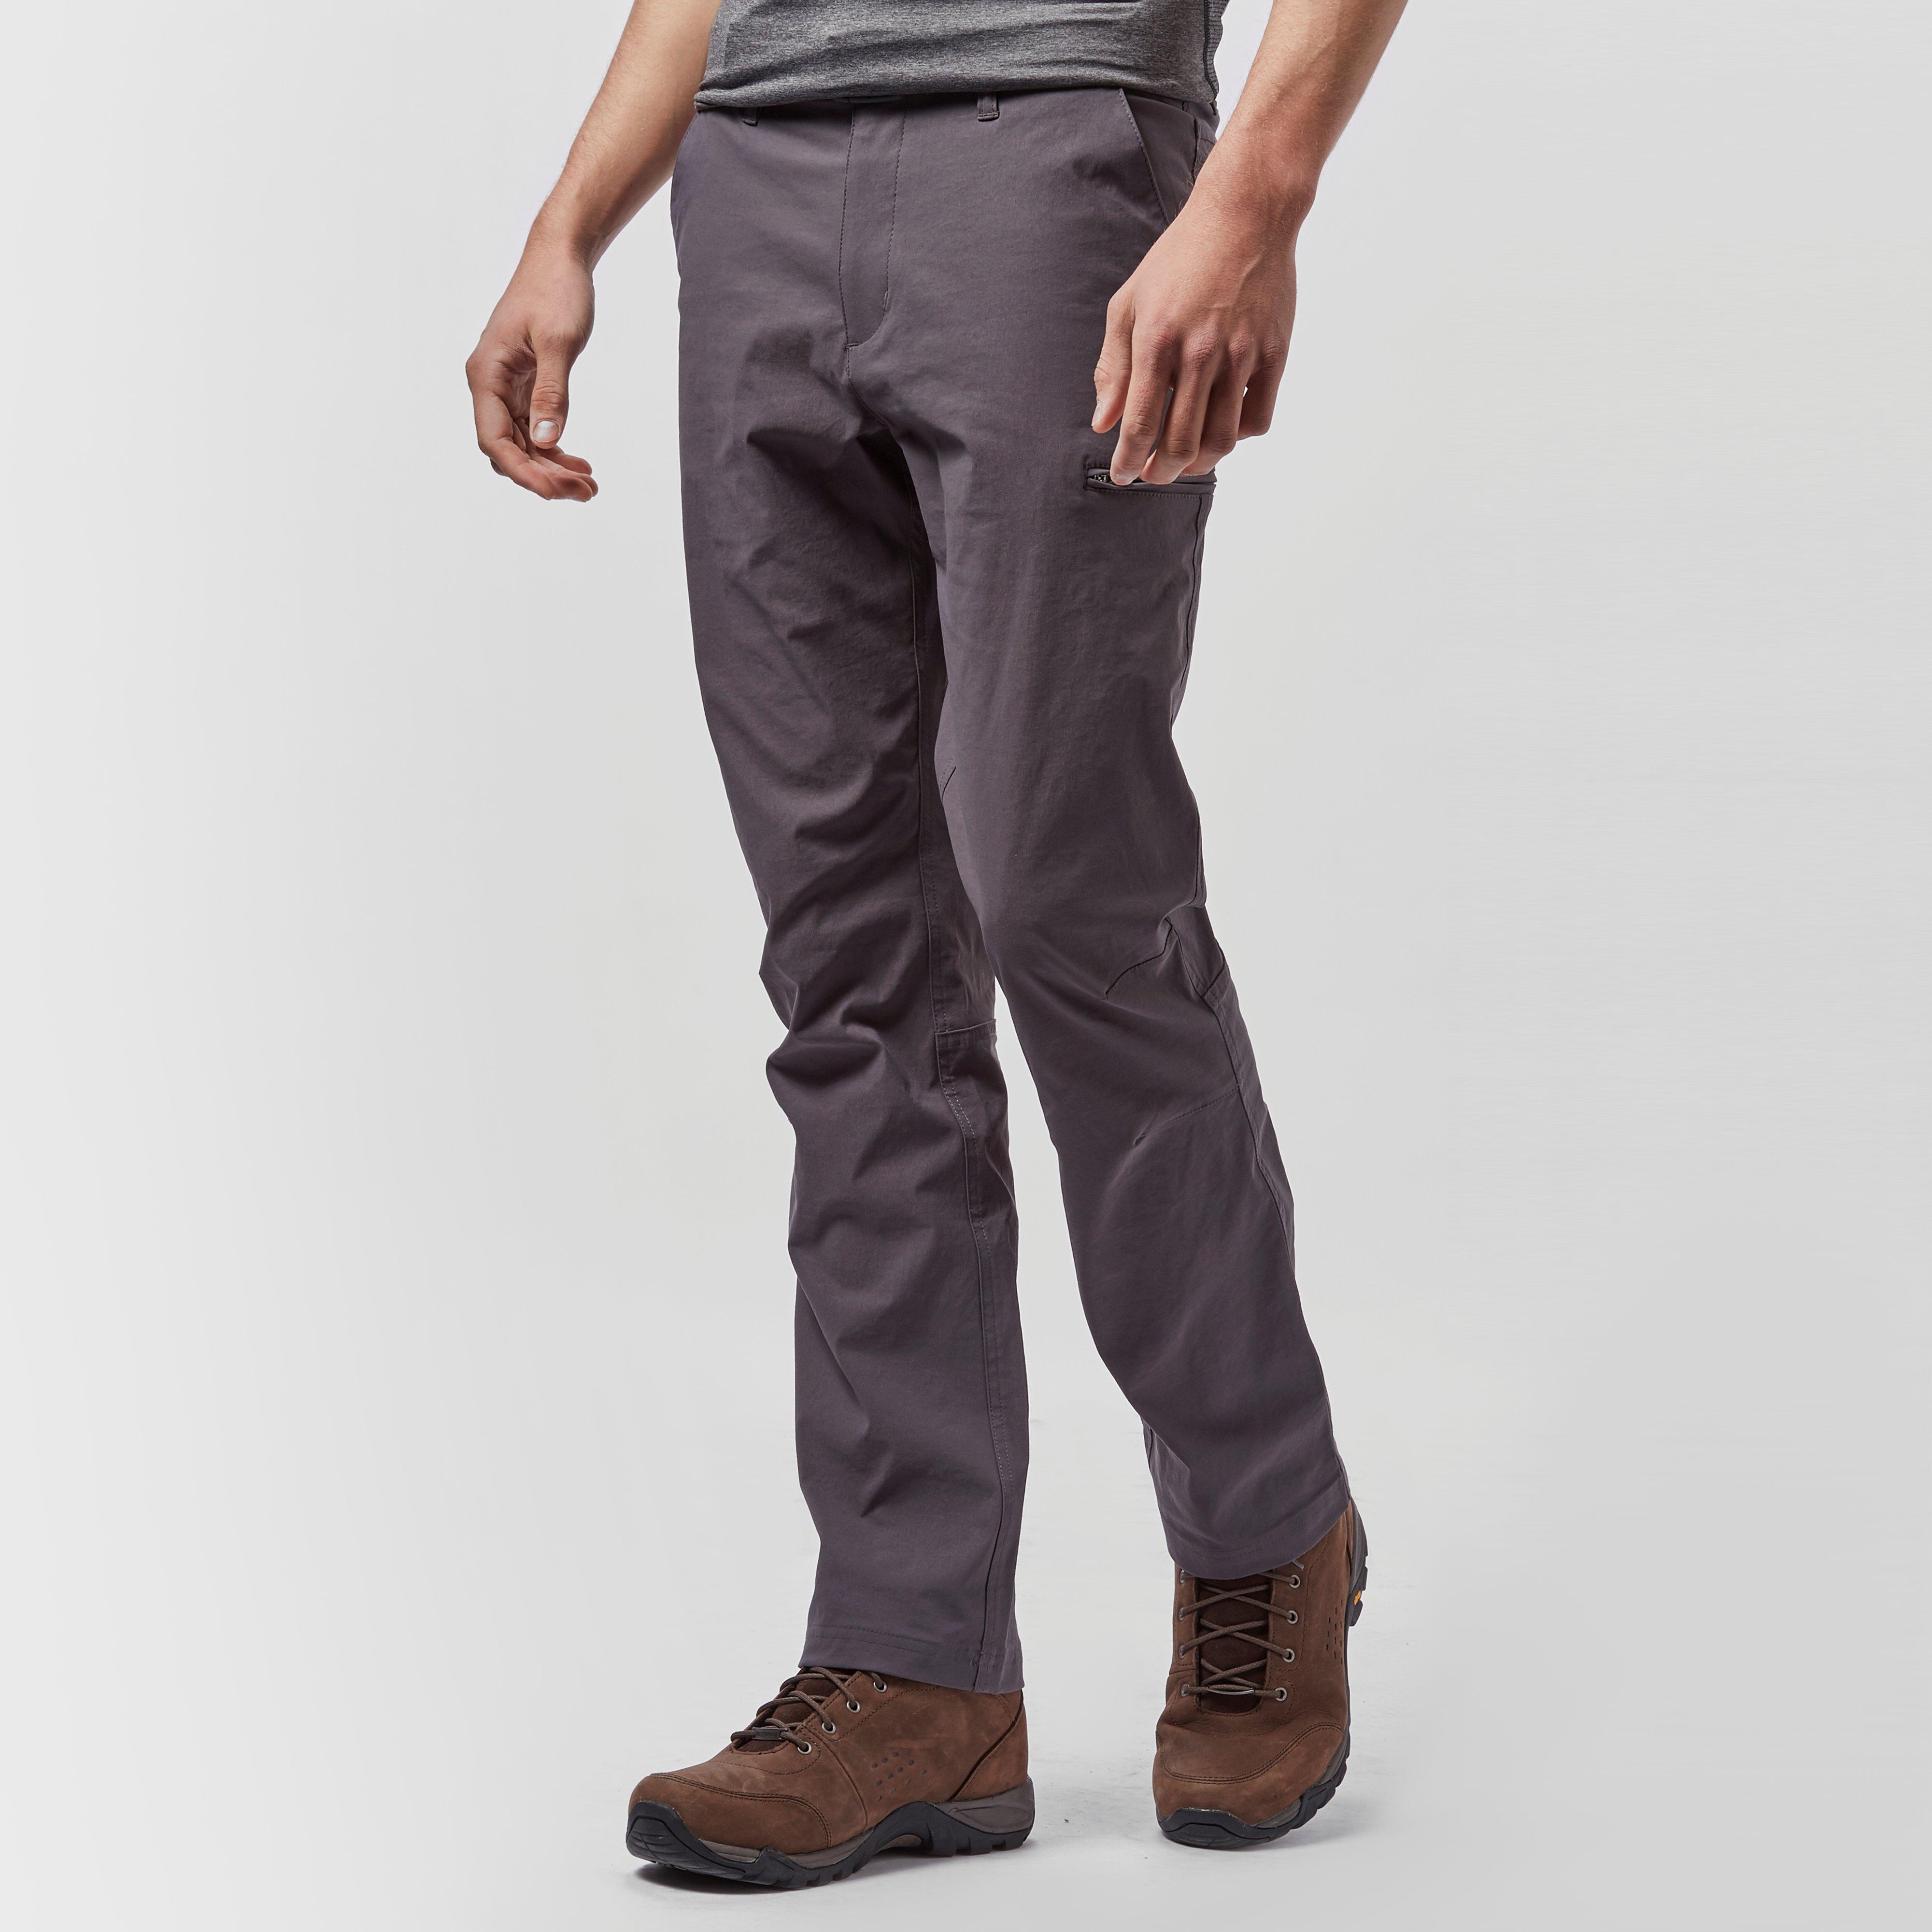 Brasher Mens Stretch Trousers - Grey/mgy  Grey/mgy